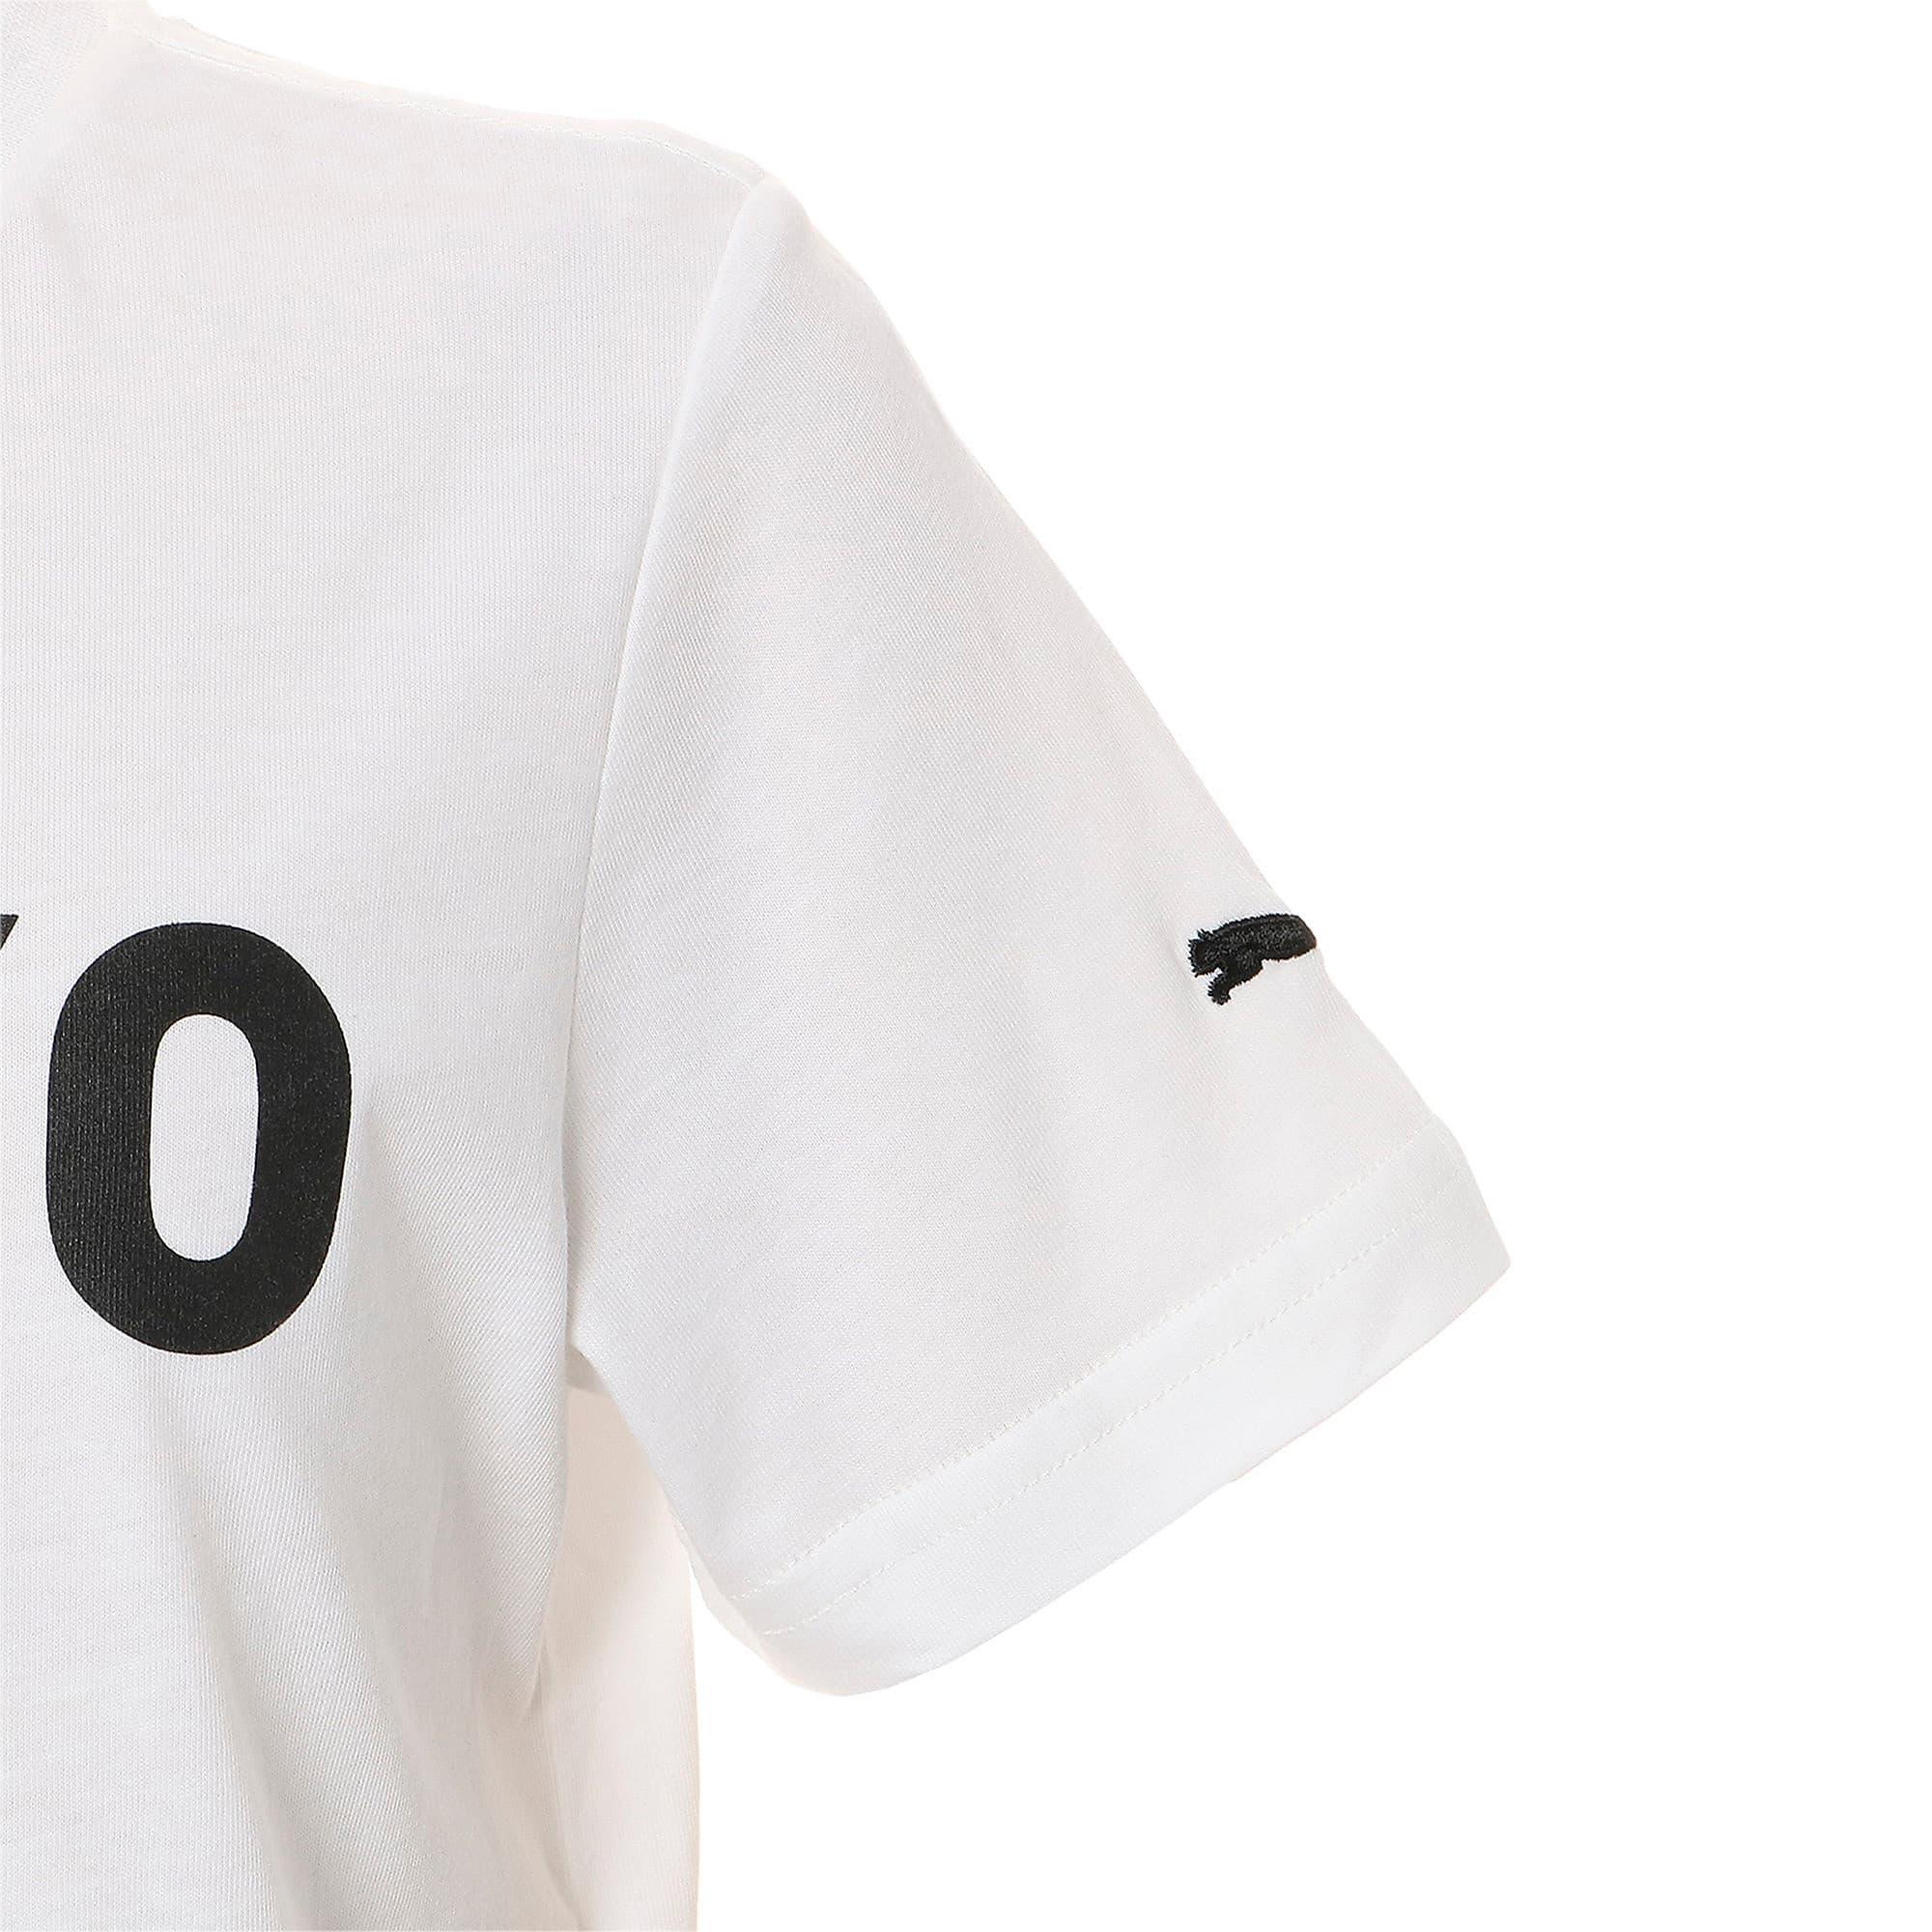 Thumbnail 5 of キッズ シティー 半袖 Tシャツ TOKYO 東京, Puma White, medium-JPN